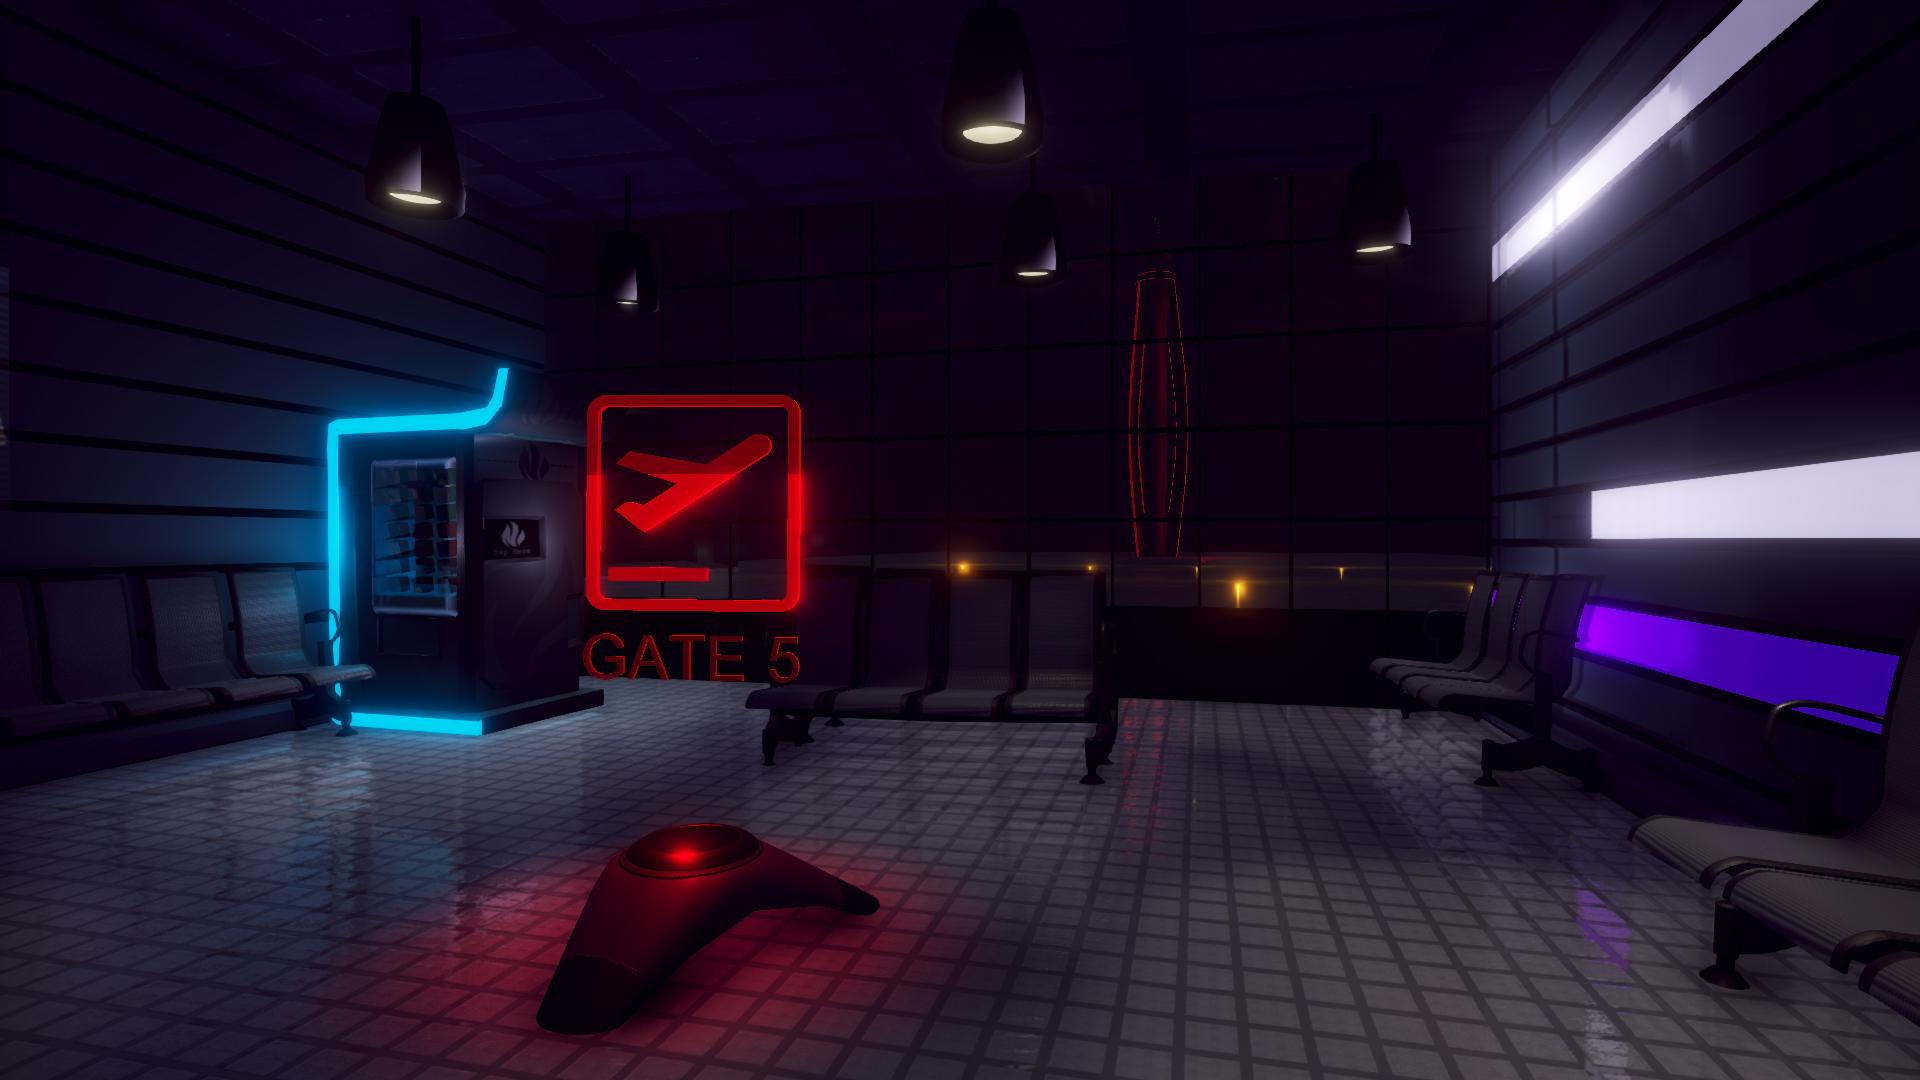 Departure Gate 5